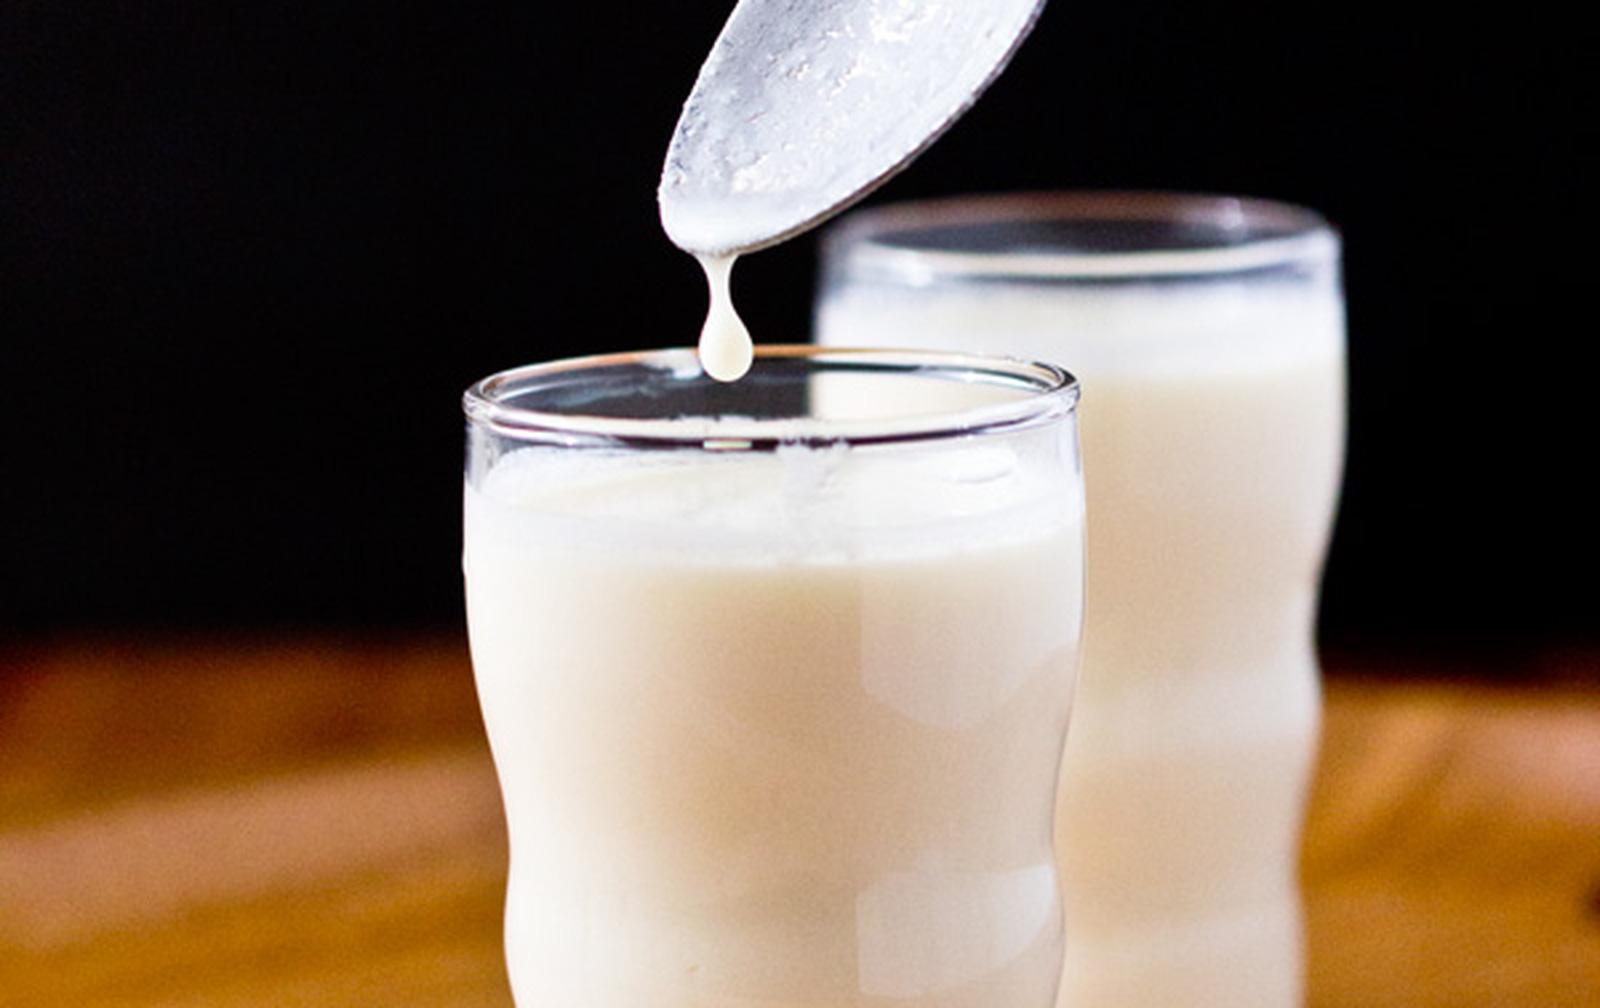 How to Make Soy Milk Kefir [Vegan, Gluten-Free]